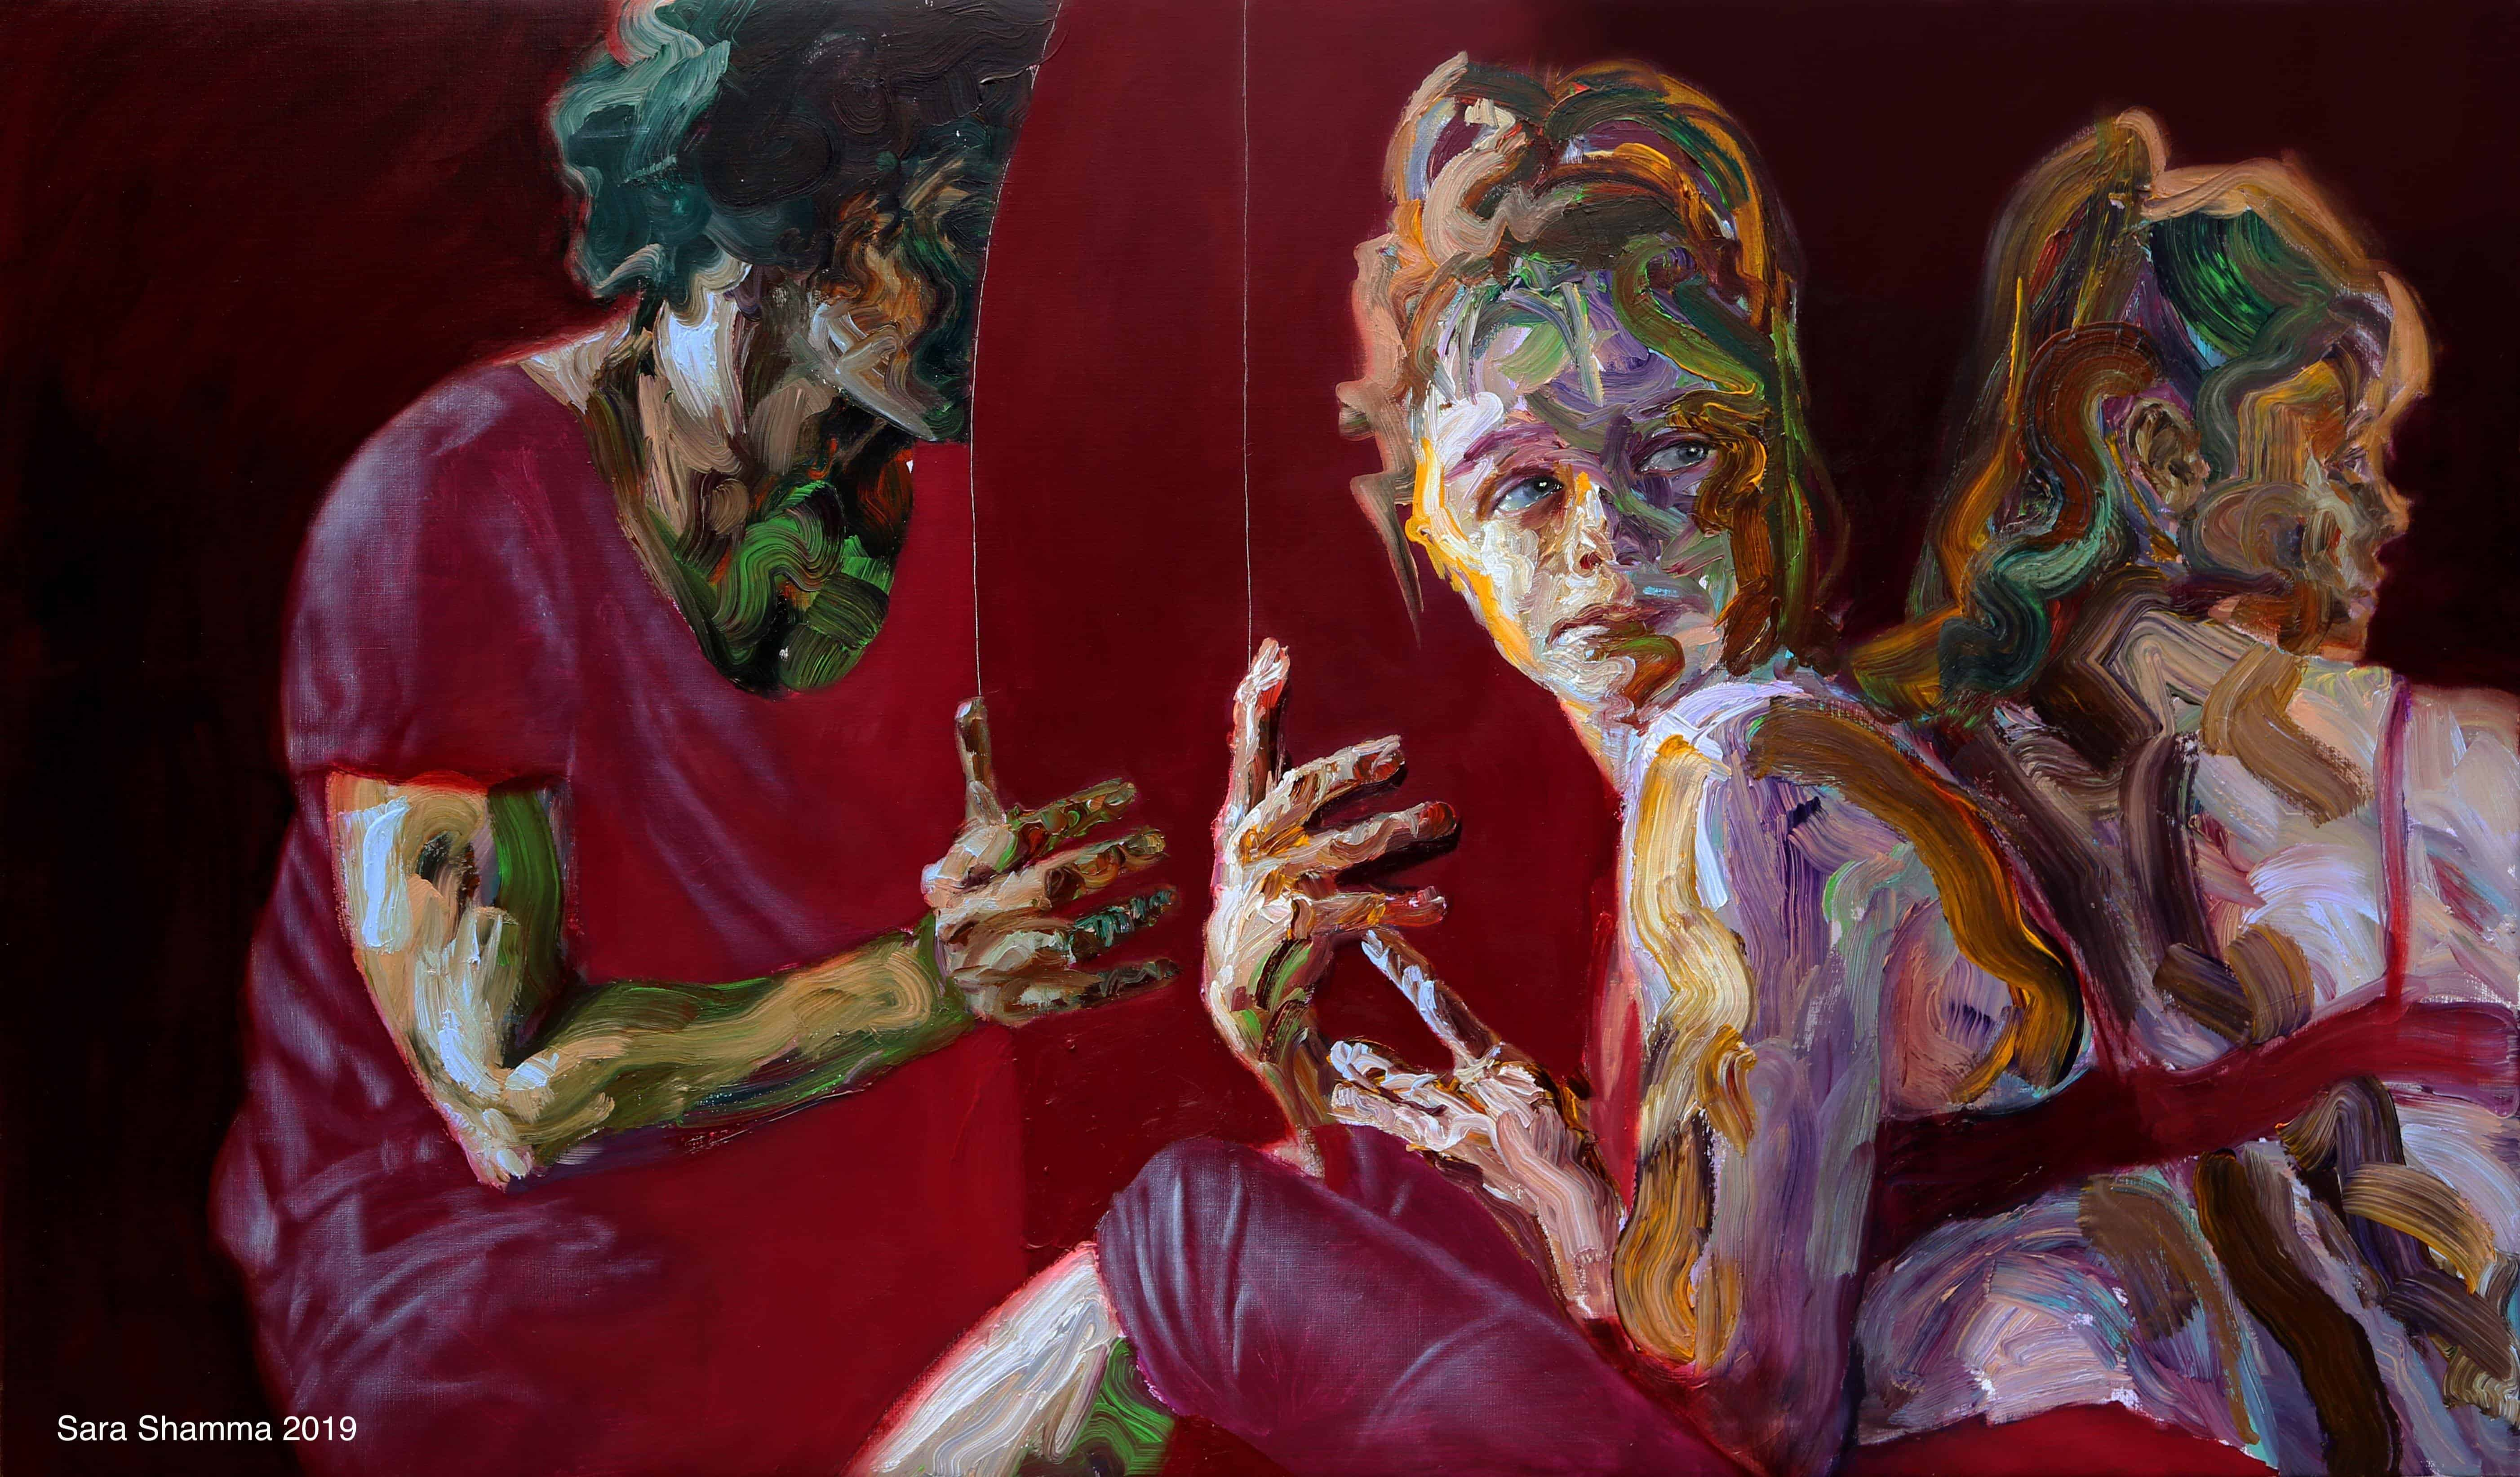 Hiding in plain sight - Sara Shamma